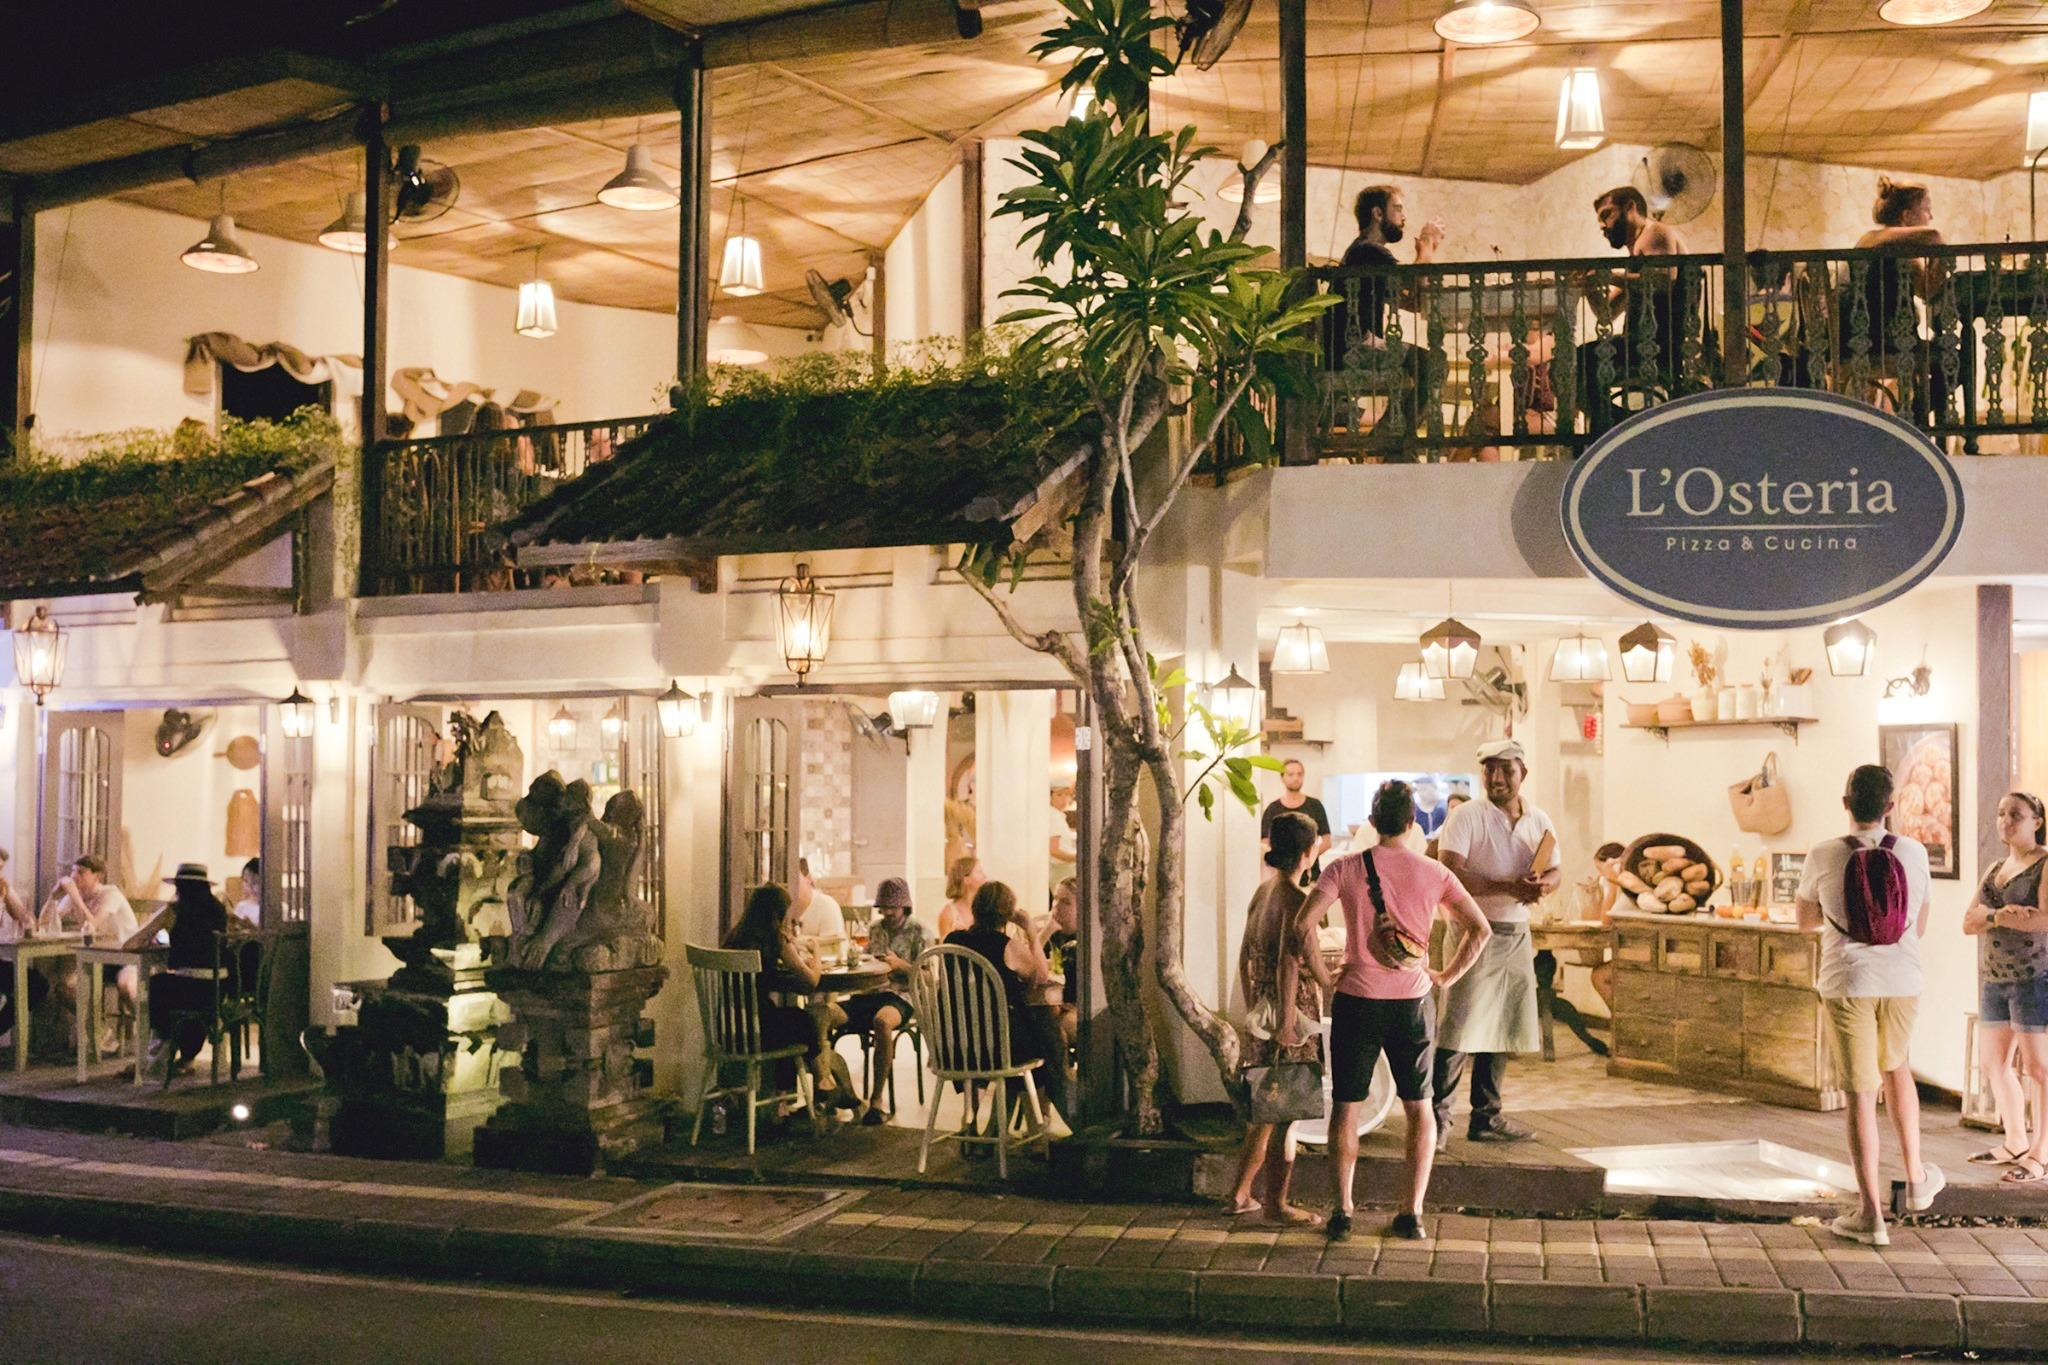 L'Osteria Restaurant